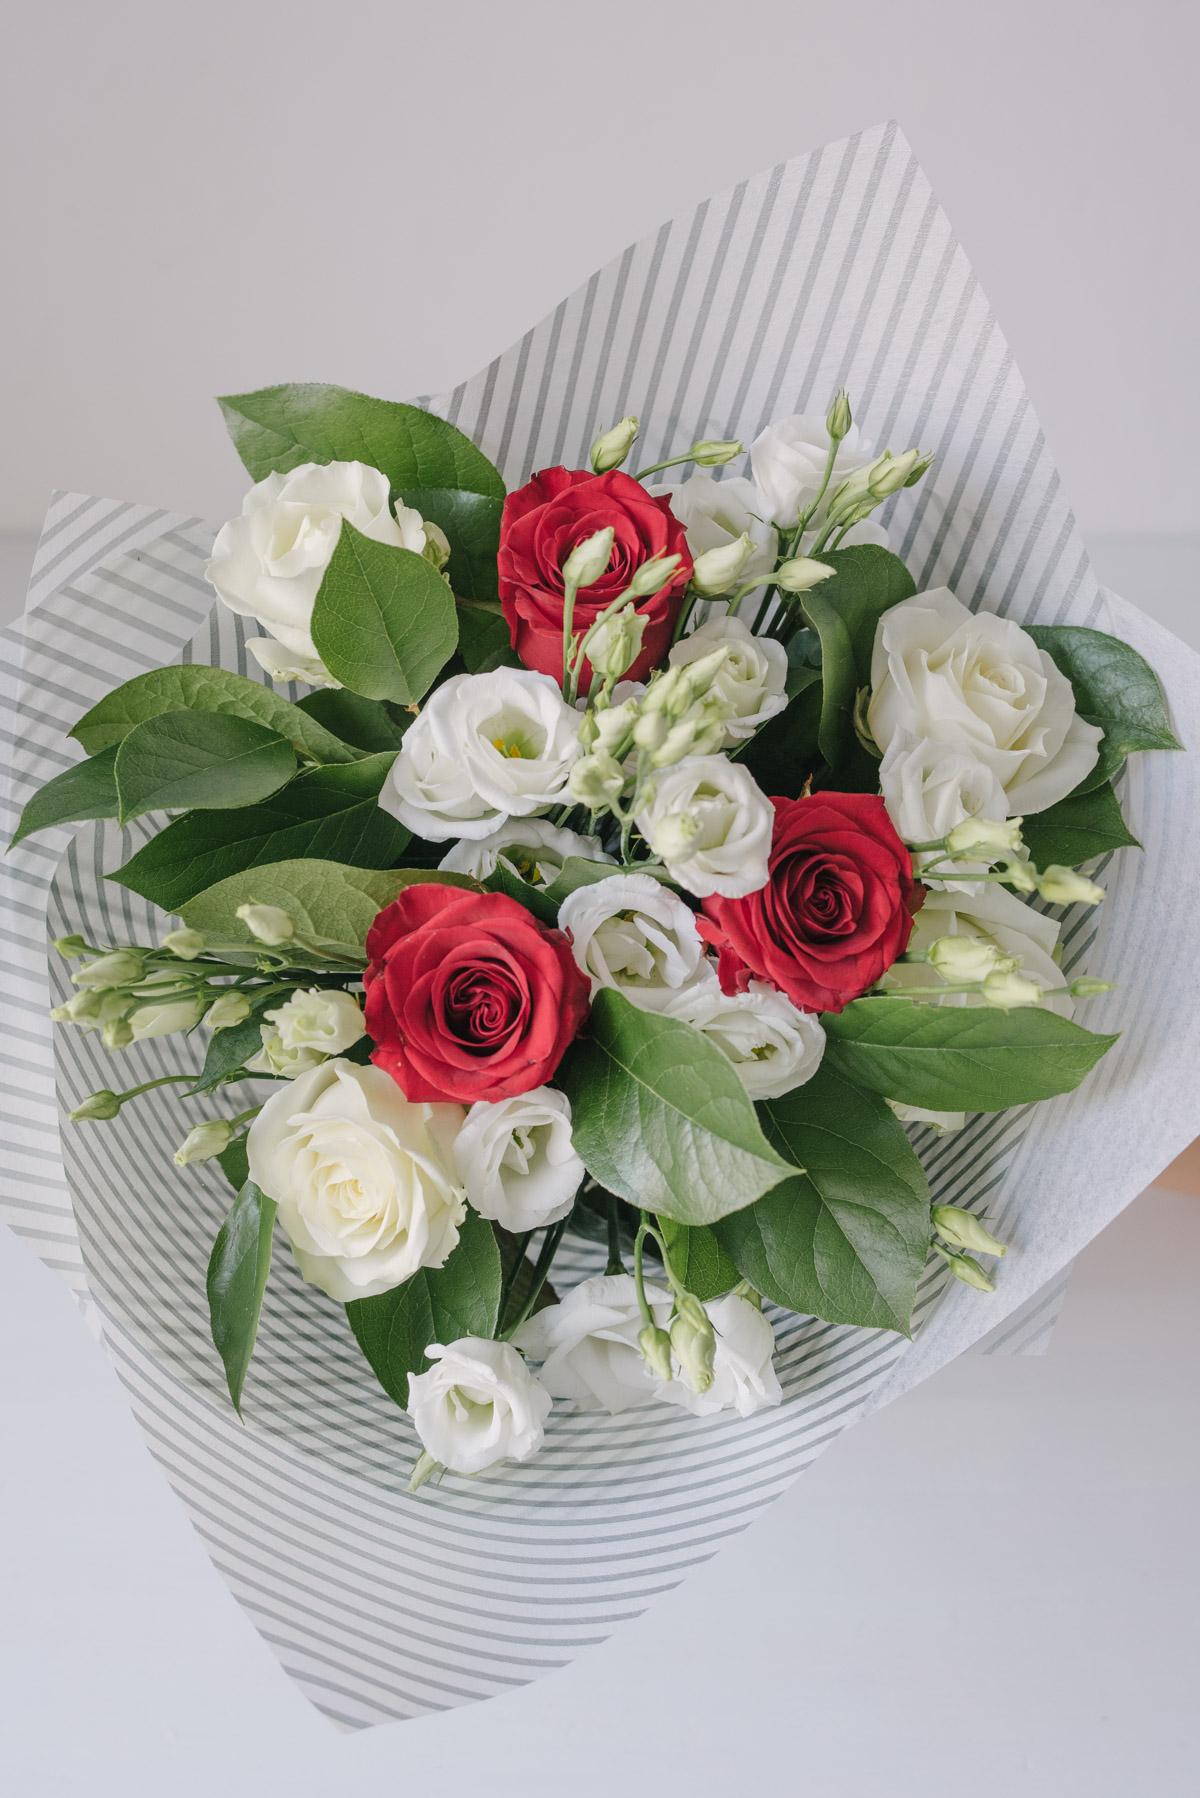 Buchet De Flori Cu Trandafiri Rosii Și Lisianthus